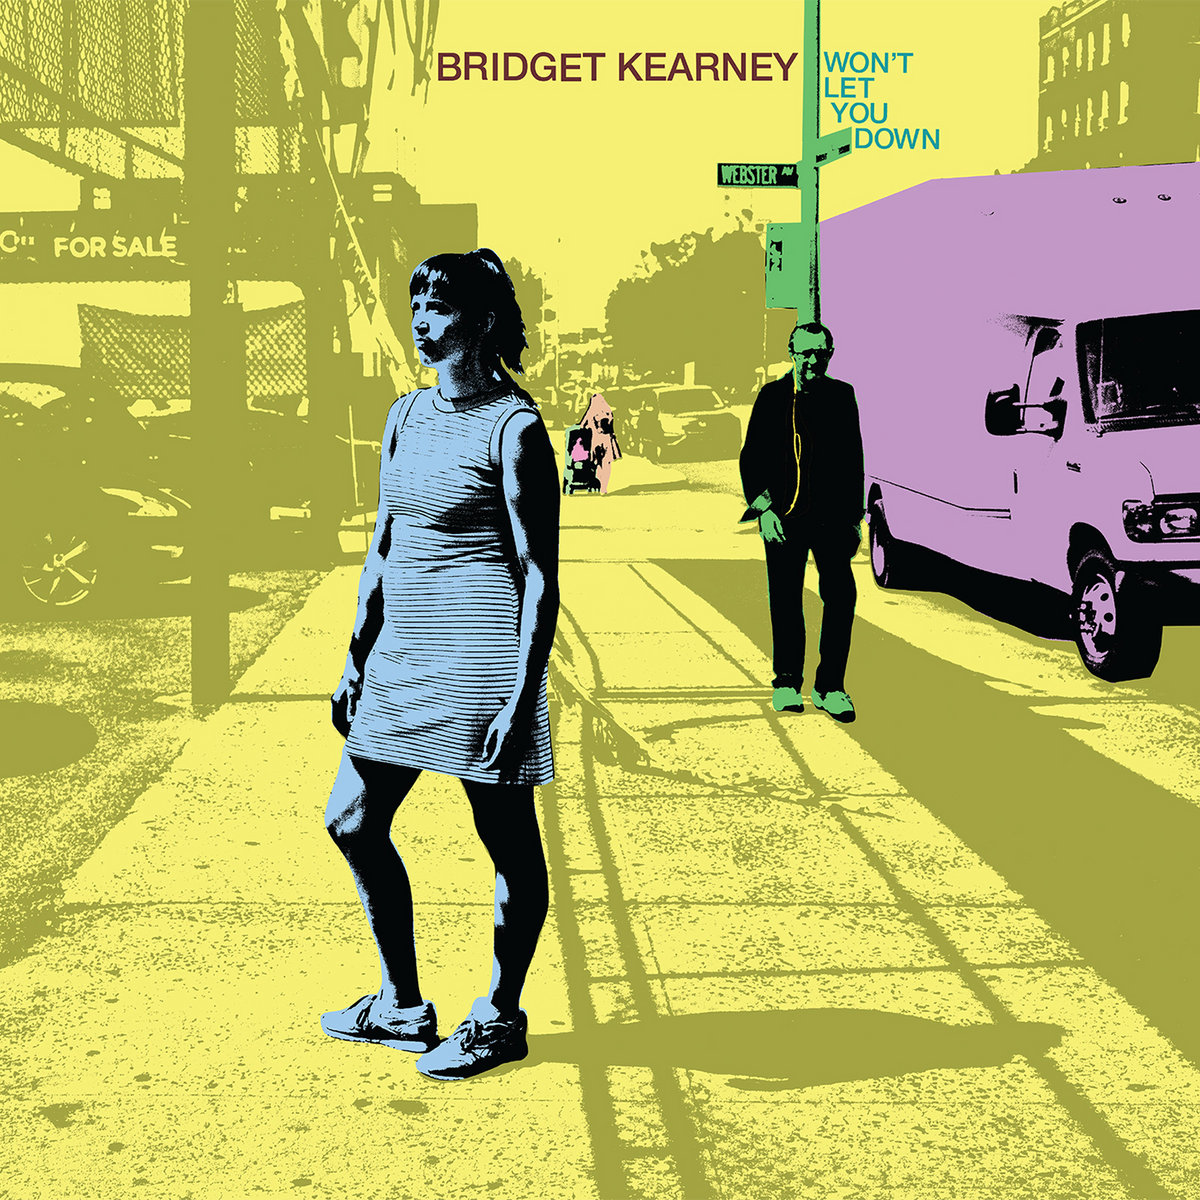 477525d63 Who Are We Kidding | Bridget Kearney